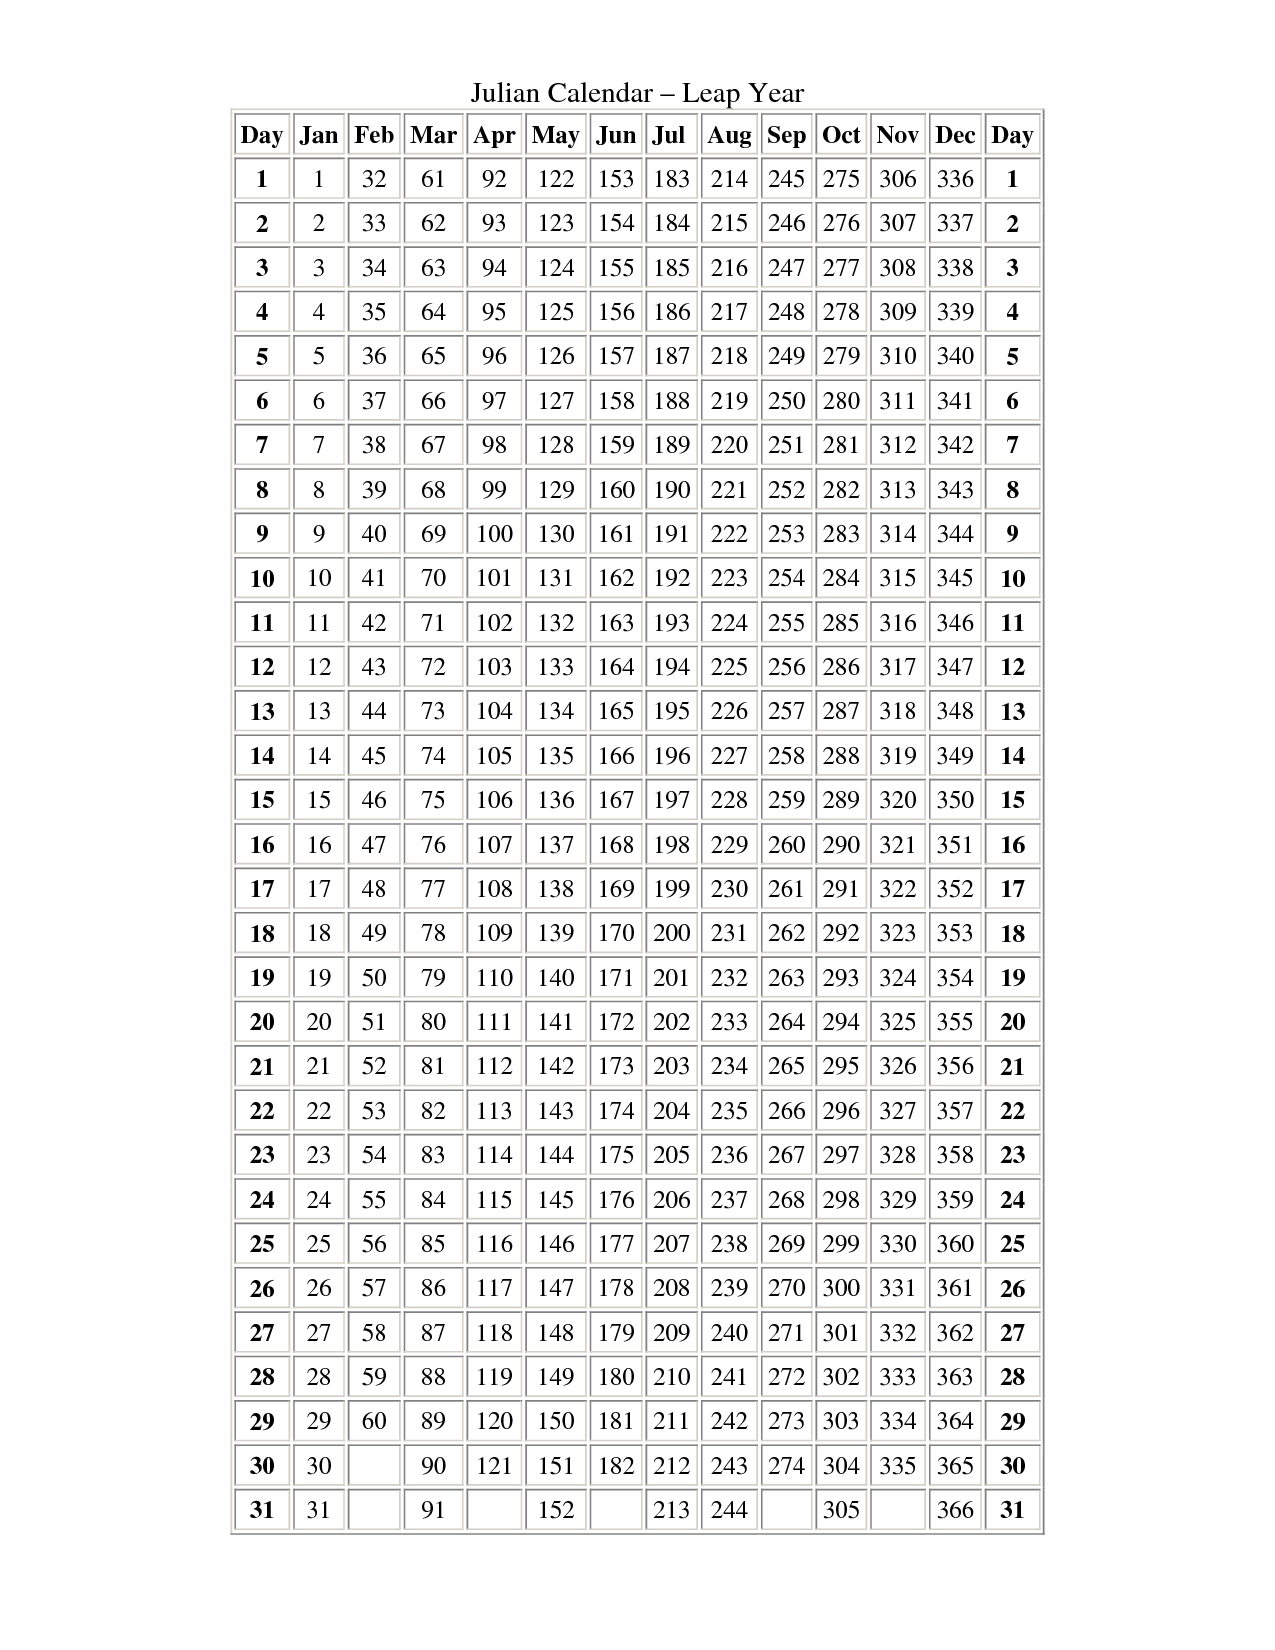 Julian Date Chart 2016 – Caska In Leap Year Julian Calendar